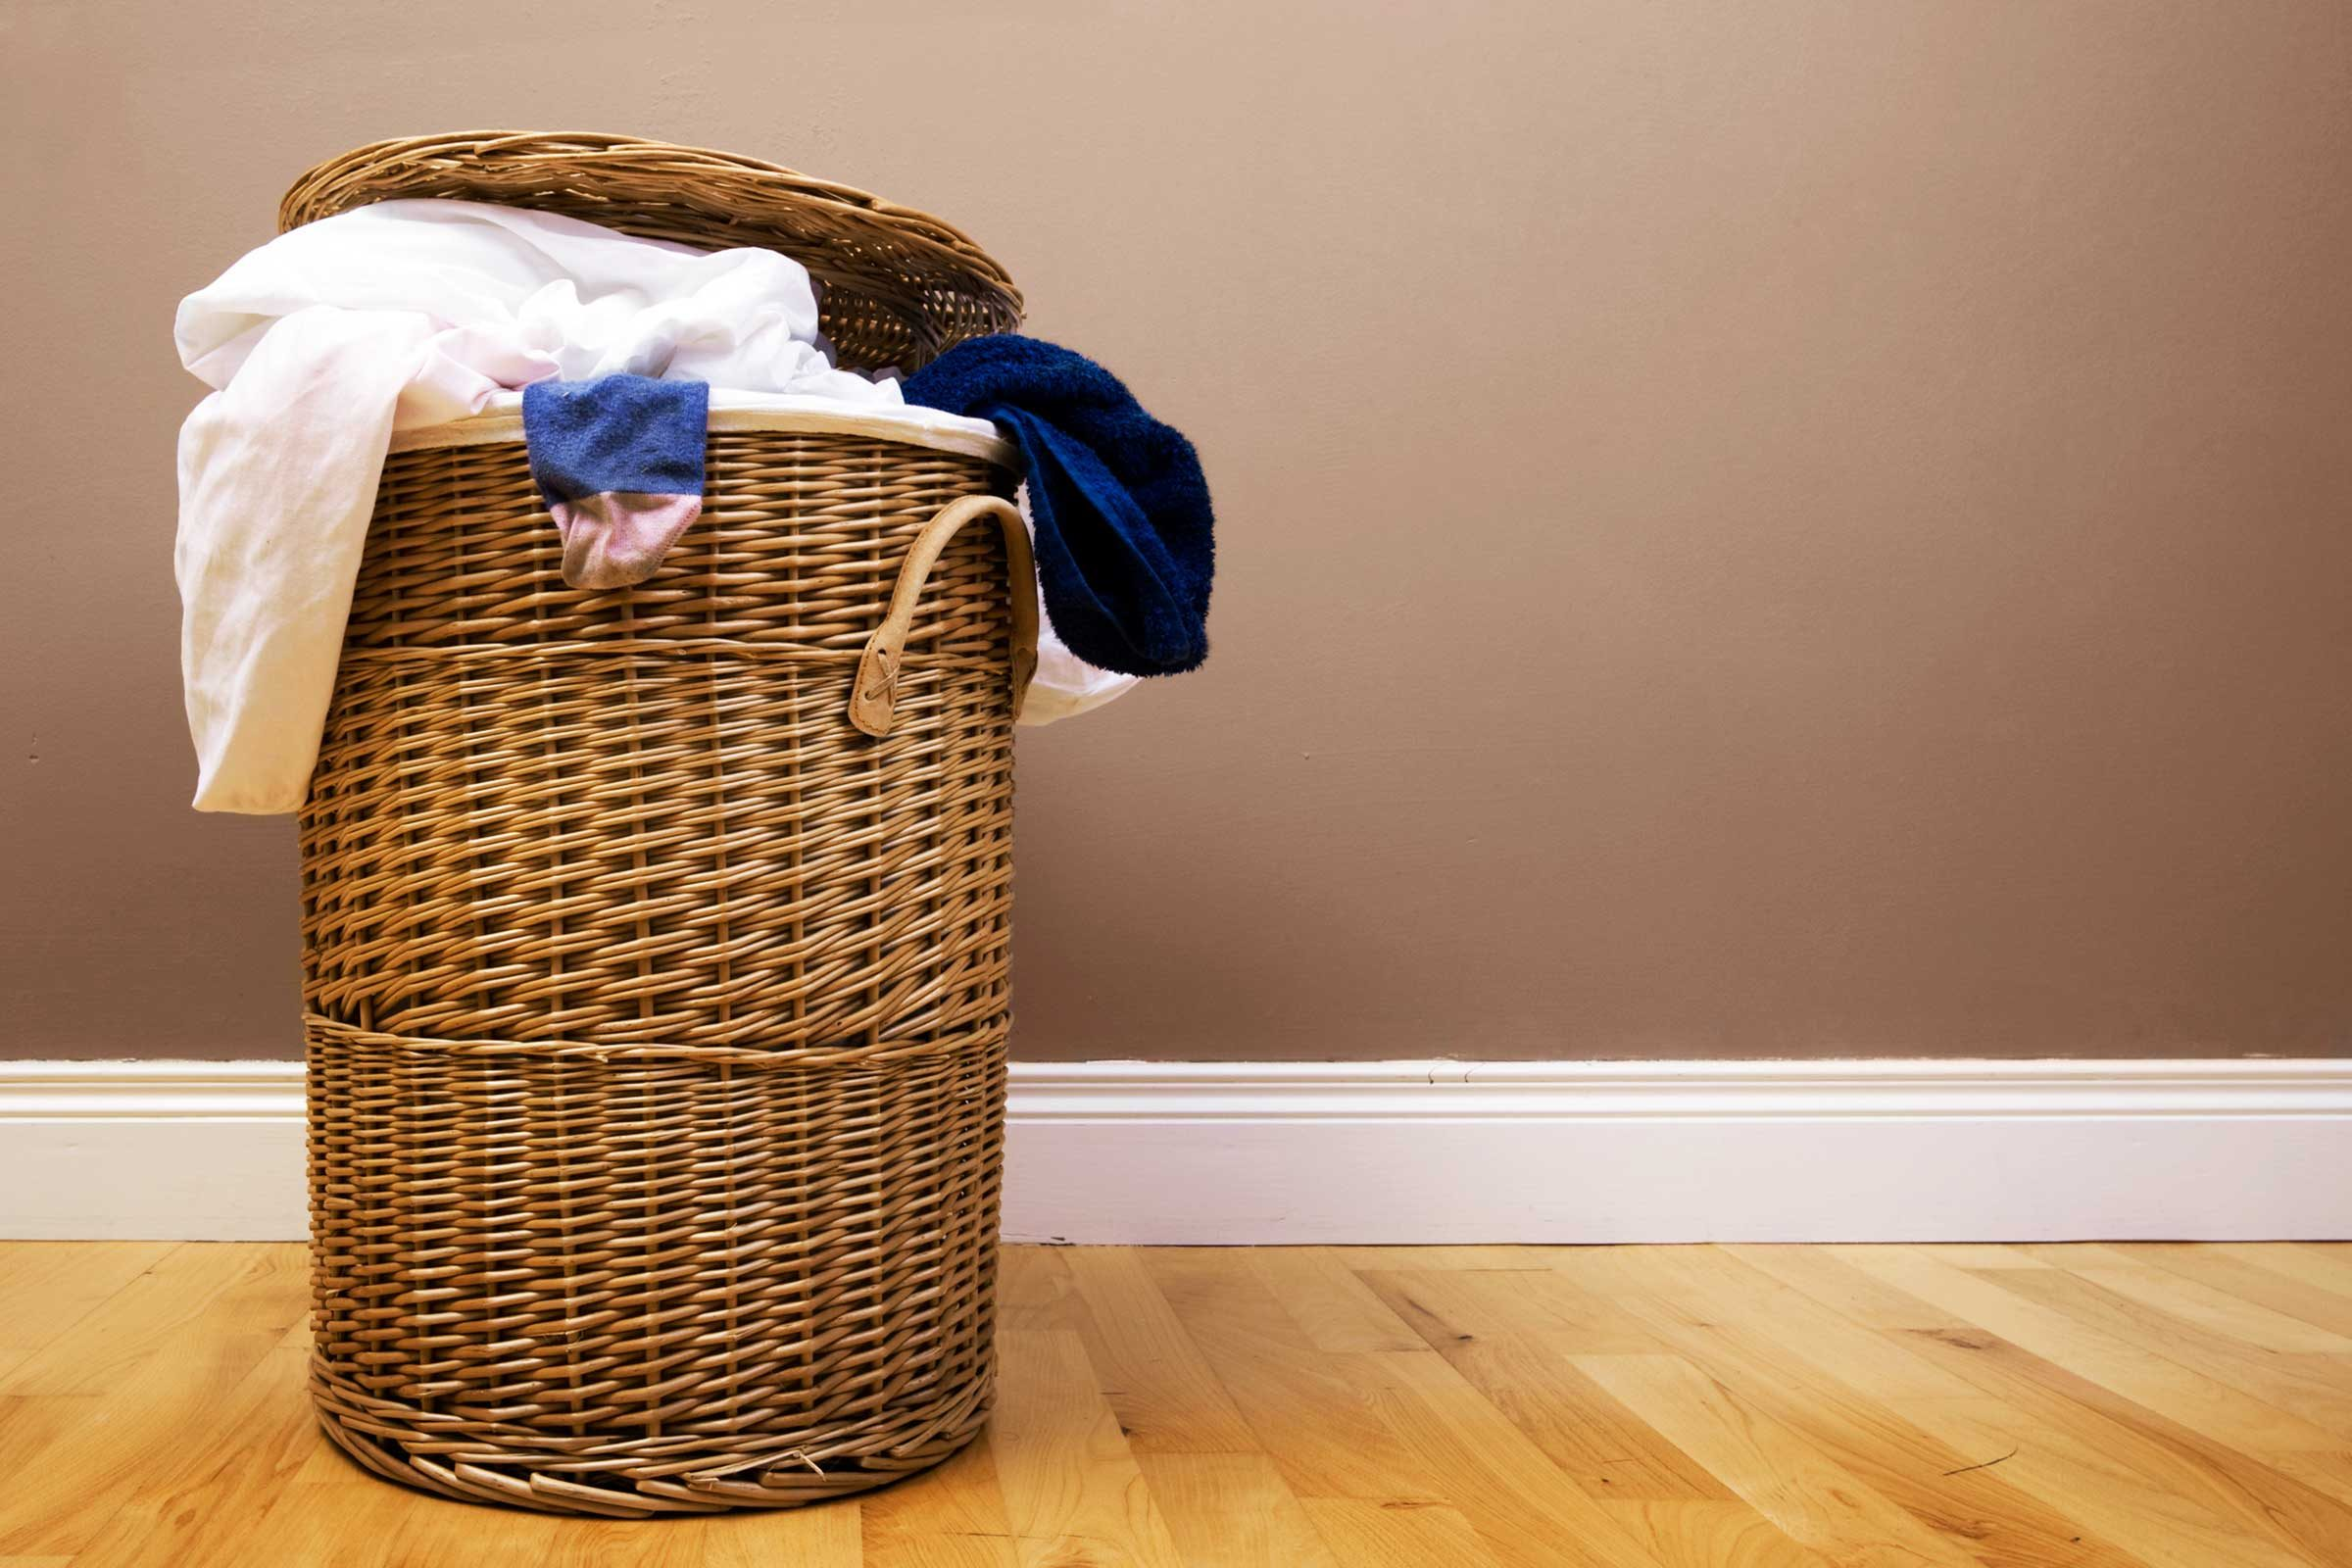 Laundry Services Bangkok